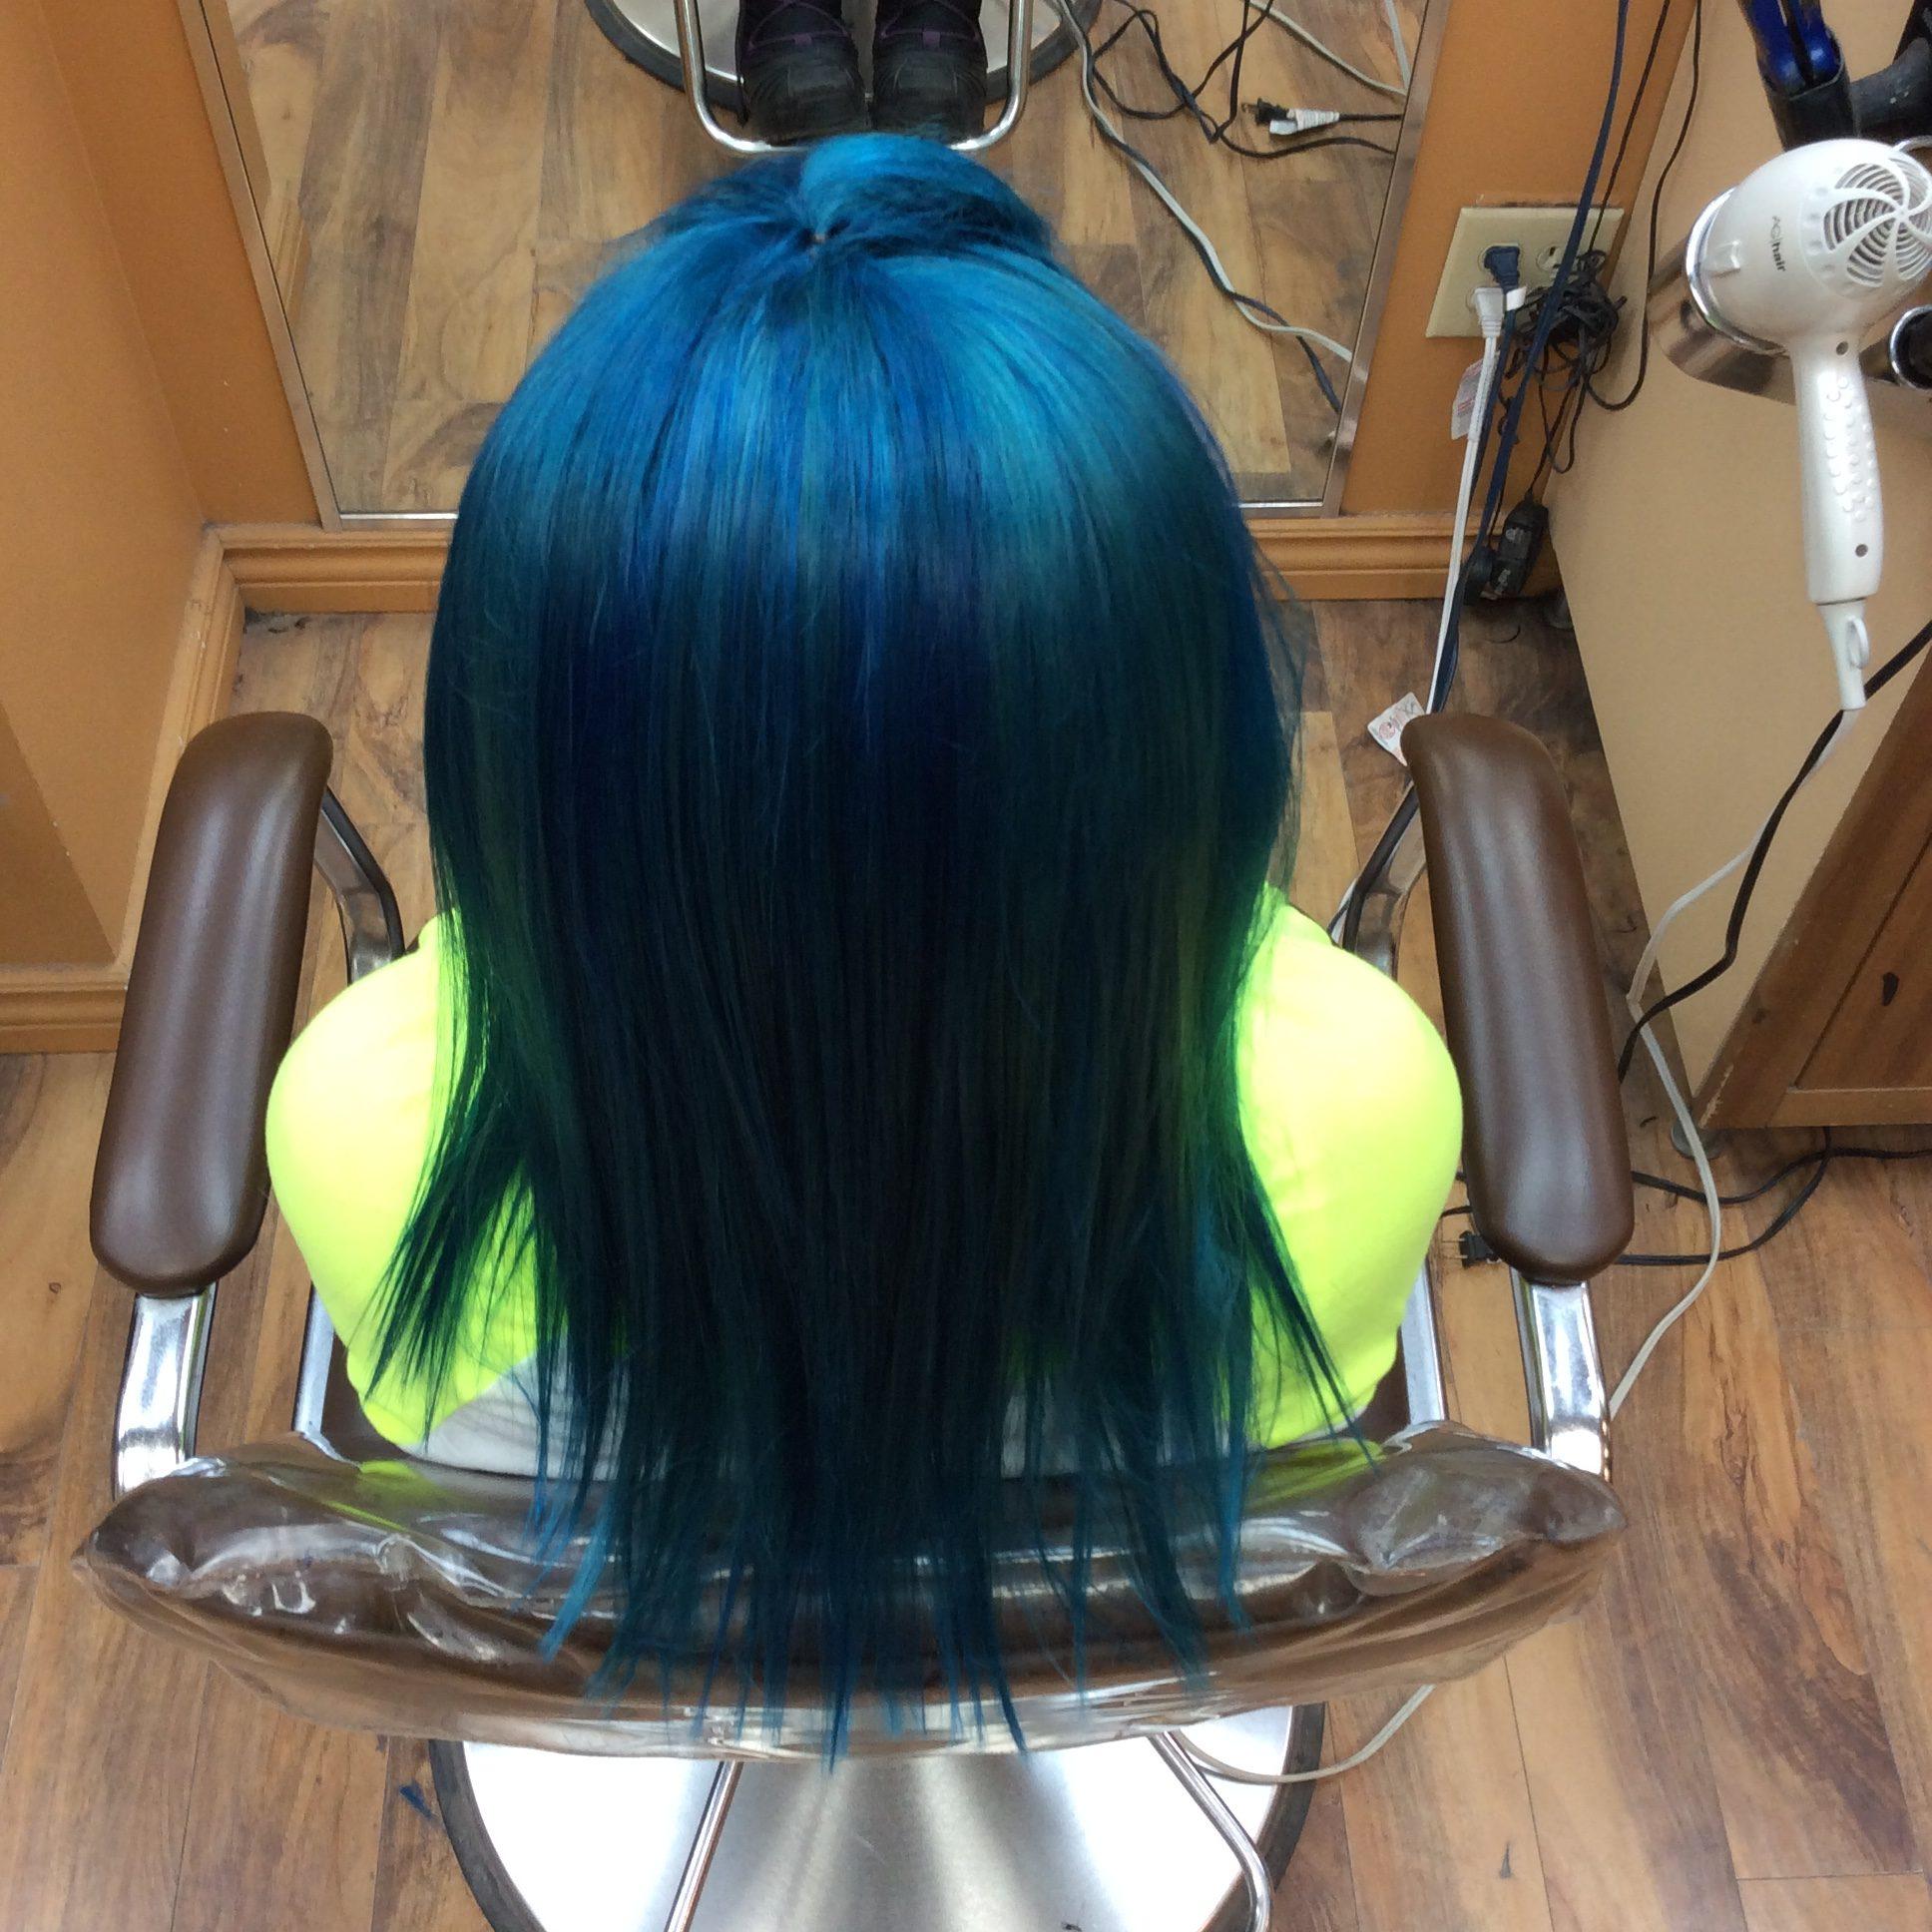 Female customer with long blue hair style at hairstyle inn saskatoon